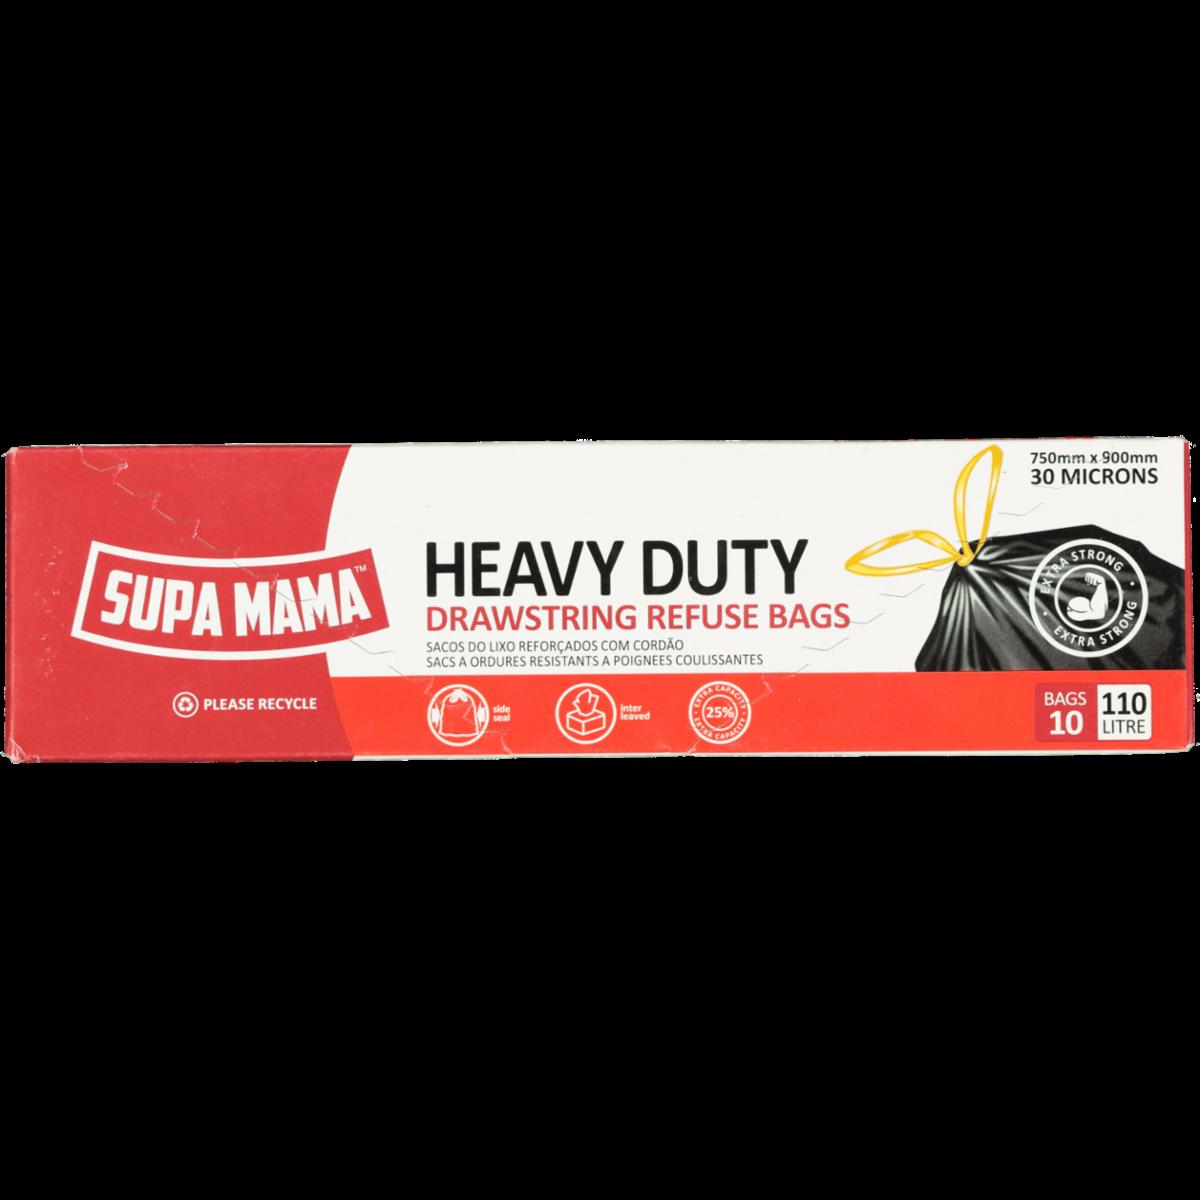 SUPA MAMA HEAVY DUTY REFUSE BAGS 10S